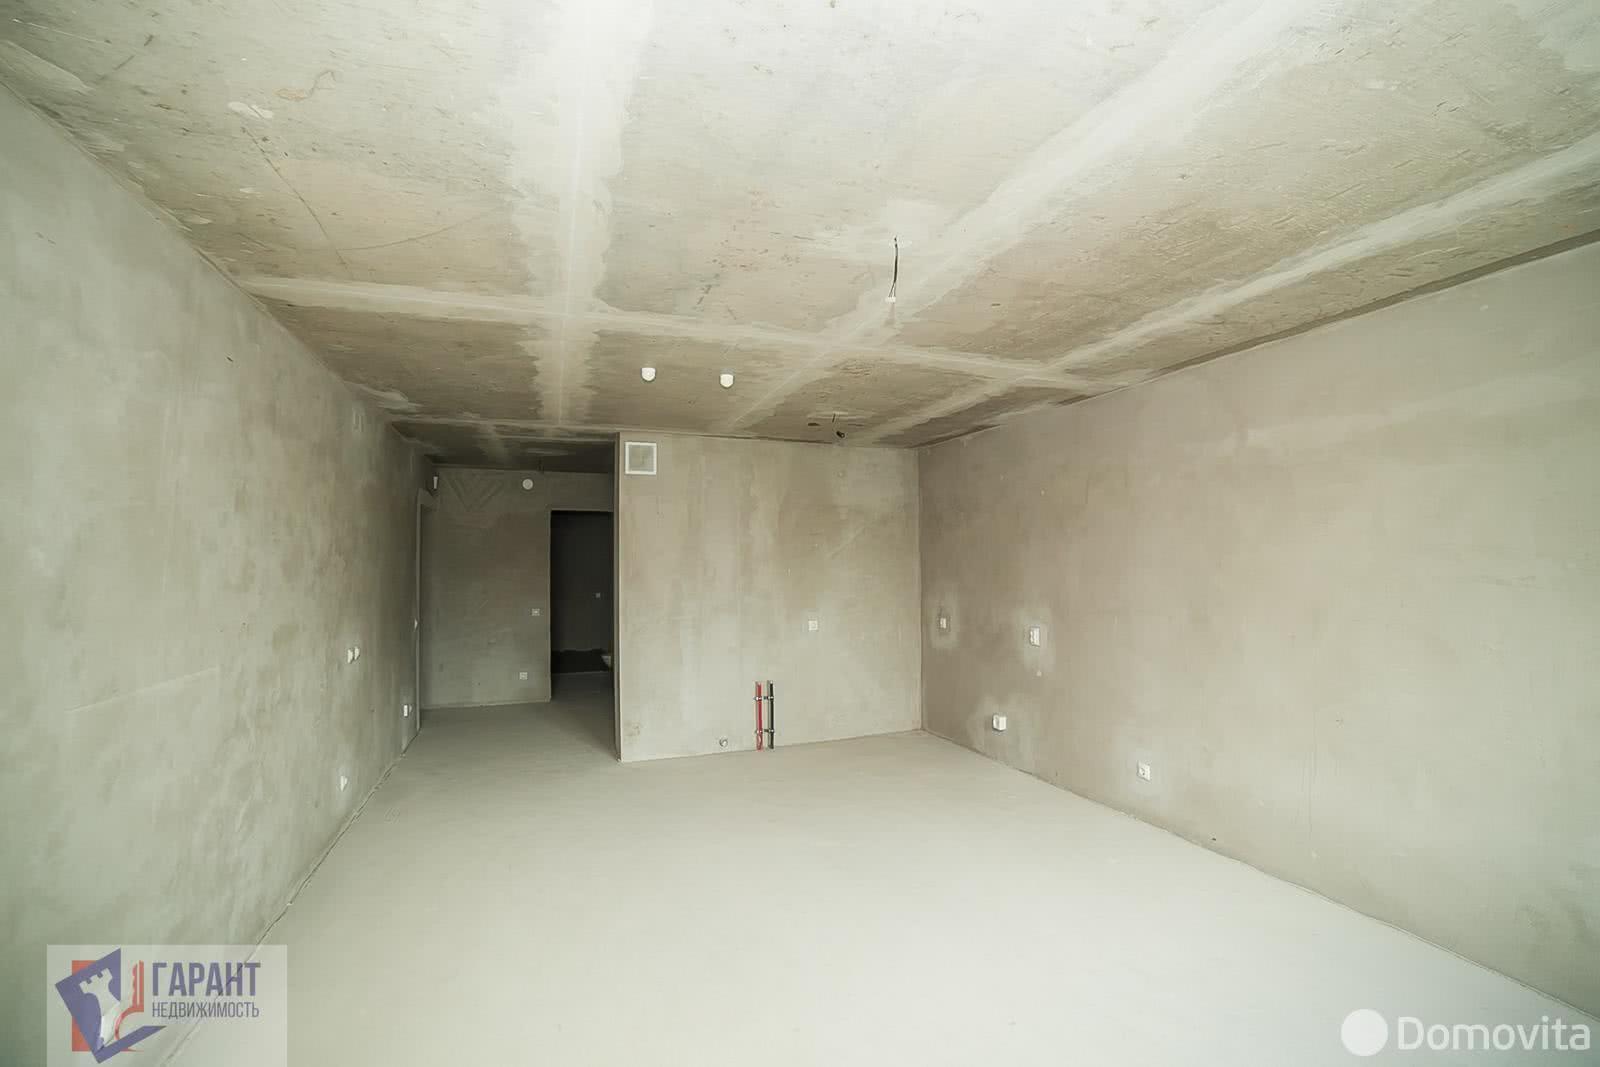 Купить 1-комнатную квартиру в Минске, пер. Зубачева 3-й, д. 5 - фото 3